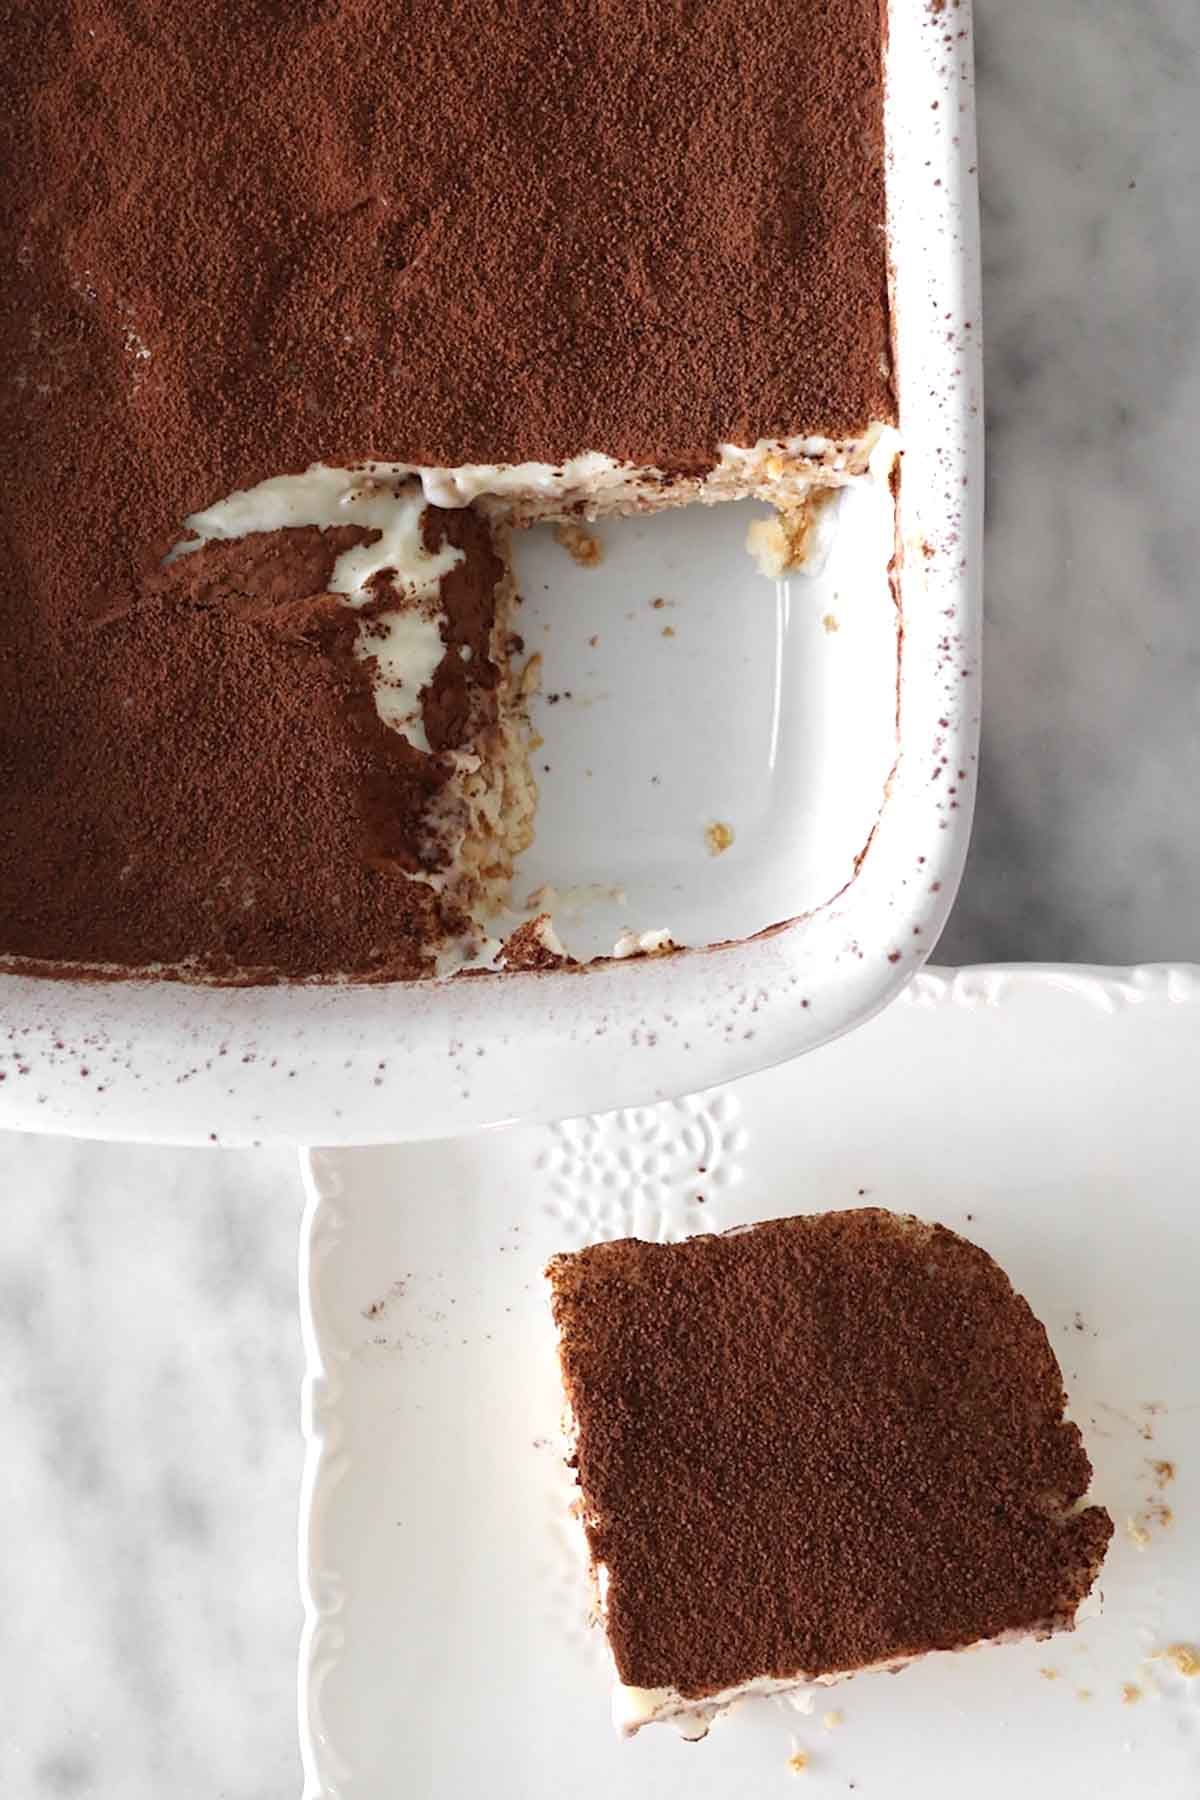 custard cake with a piece on a plate